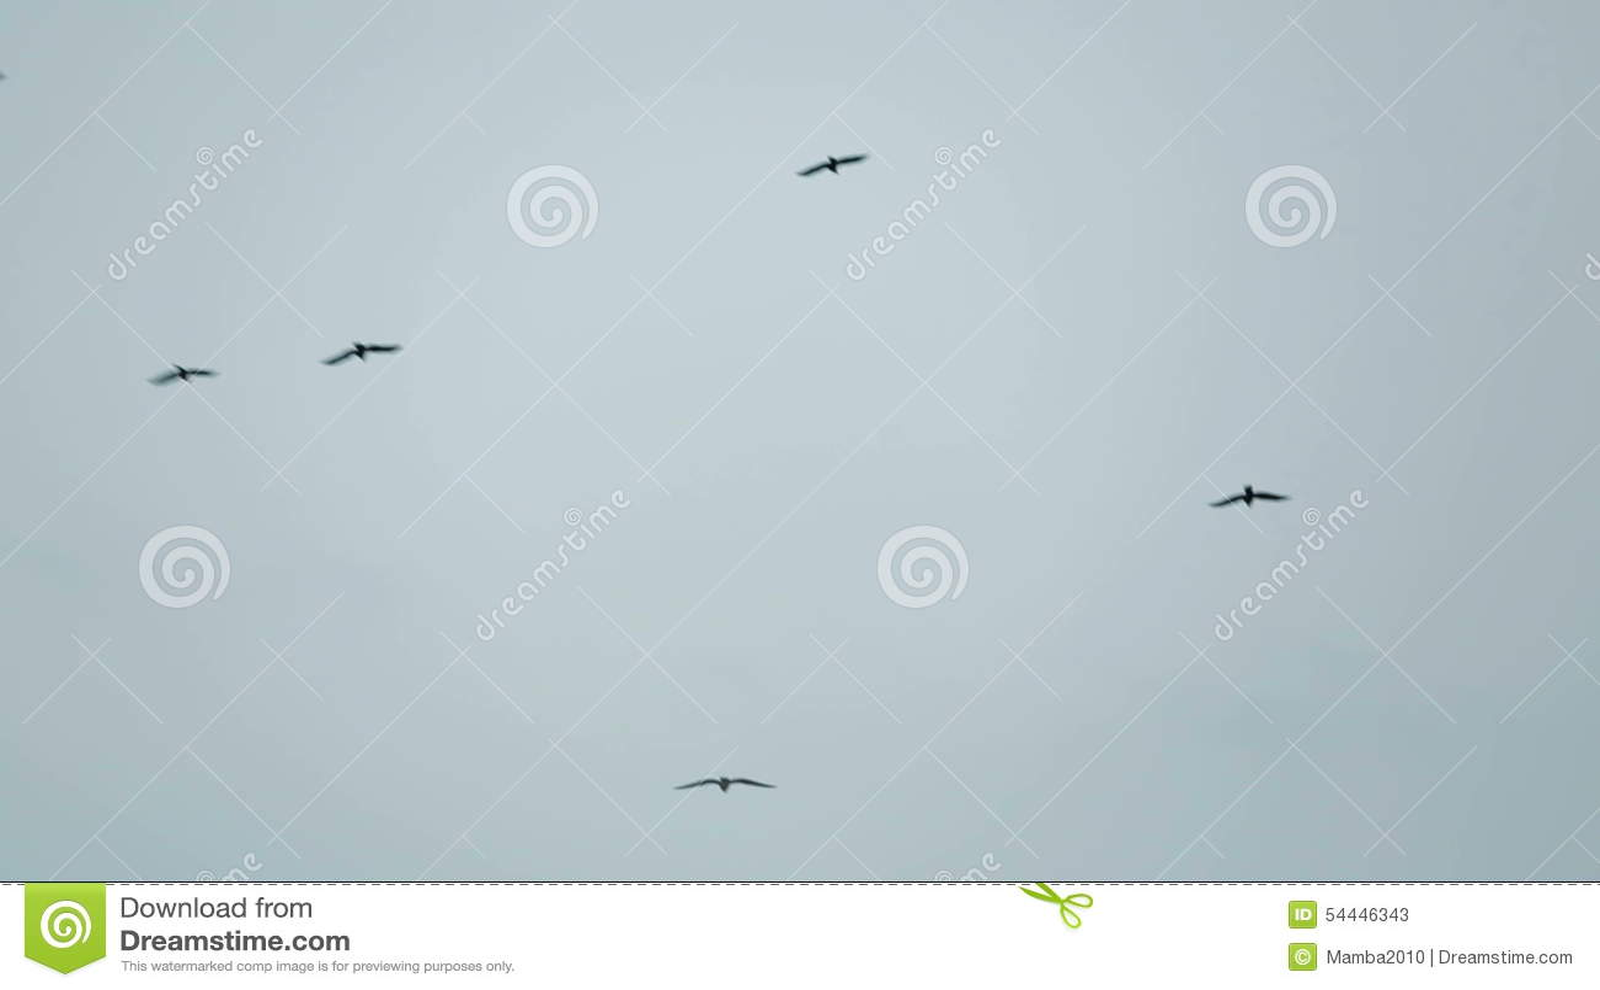 Flock Of Black Birds Flying Free In The Sky Stock Video